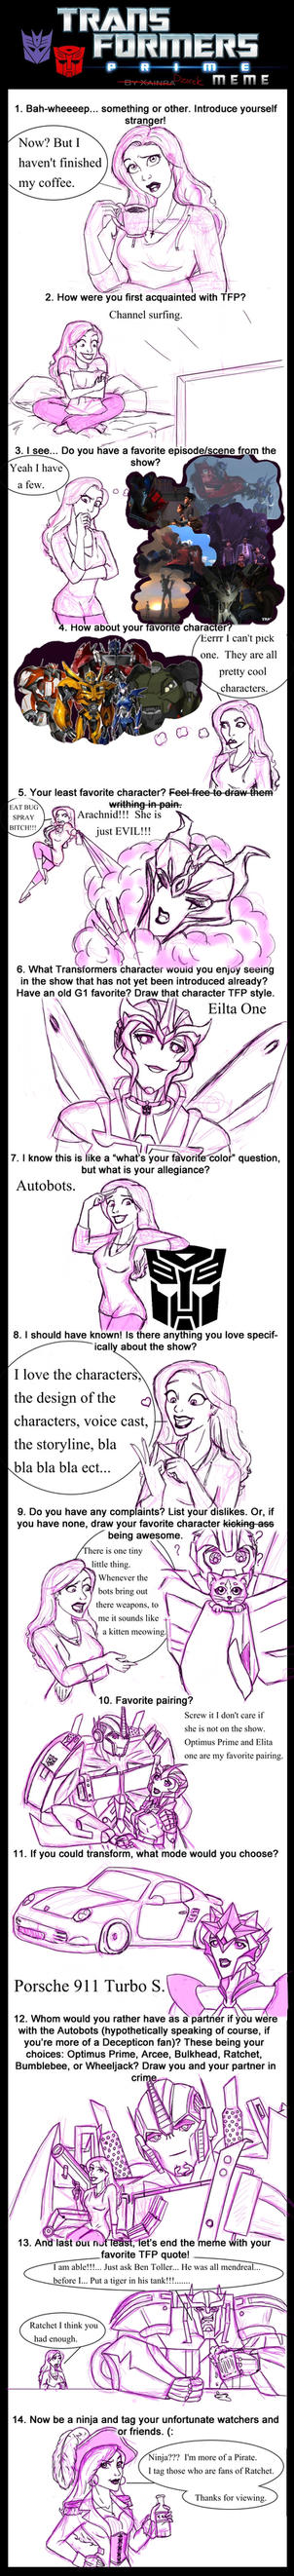 Transformers Prime Meme by Redhead-K